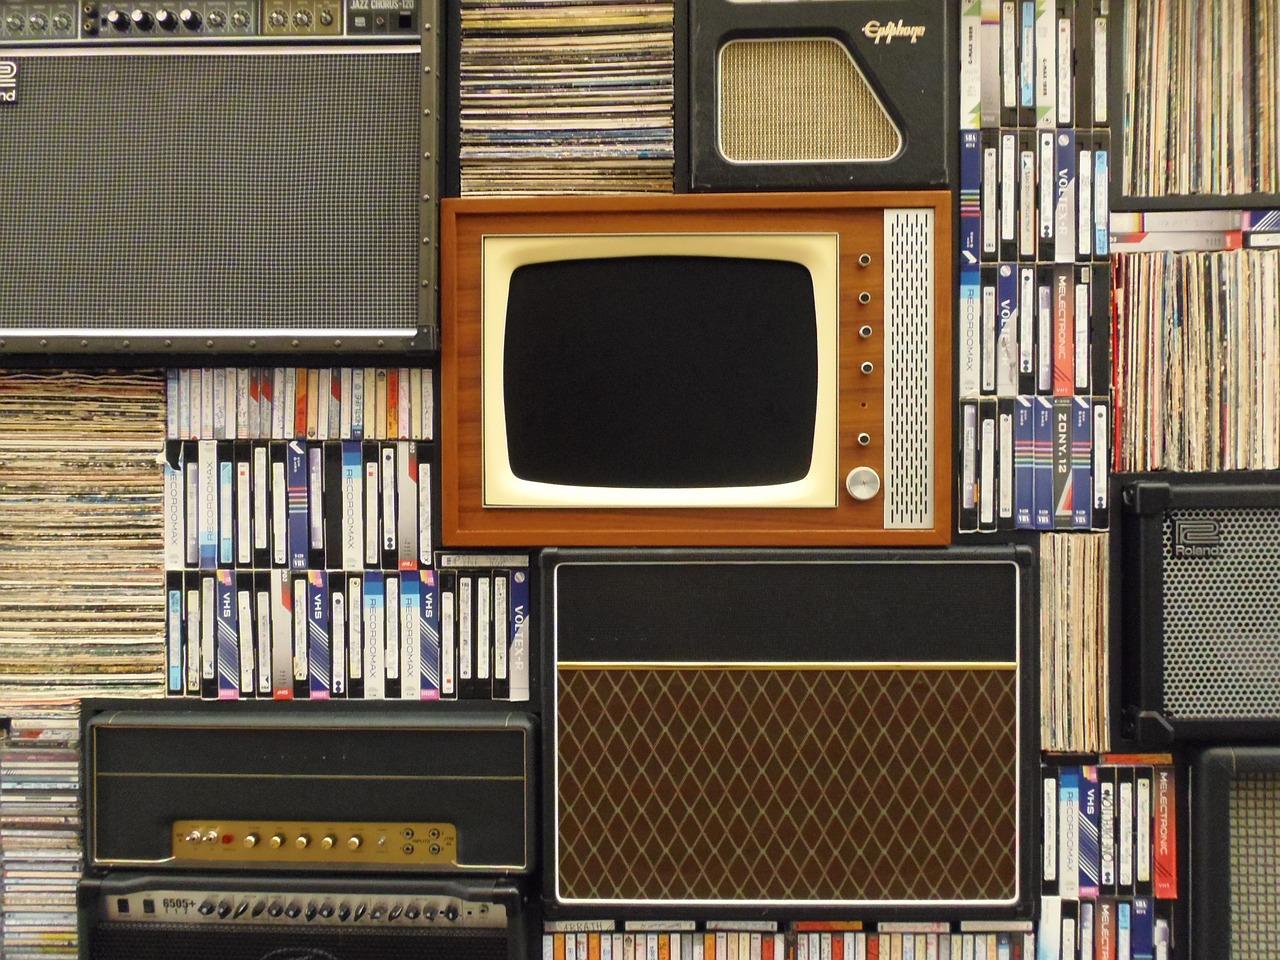 advantage and disadvantage of television essay